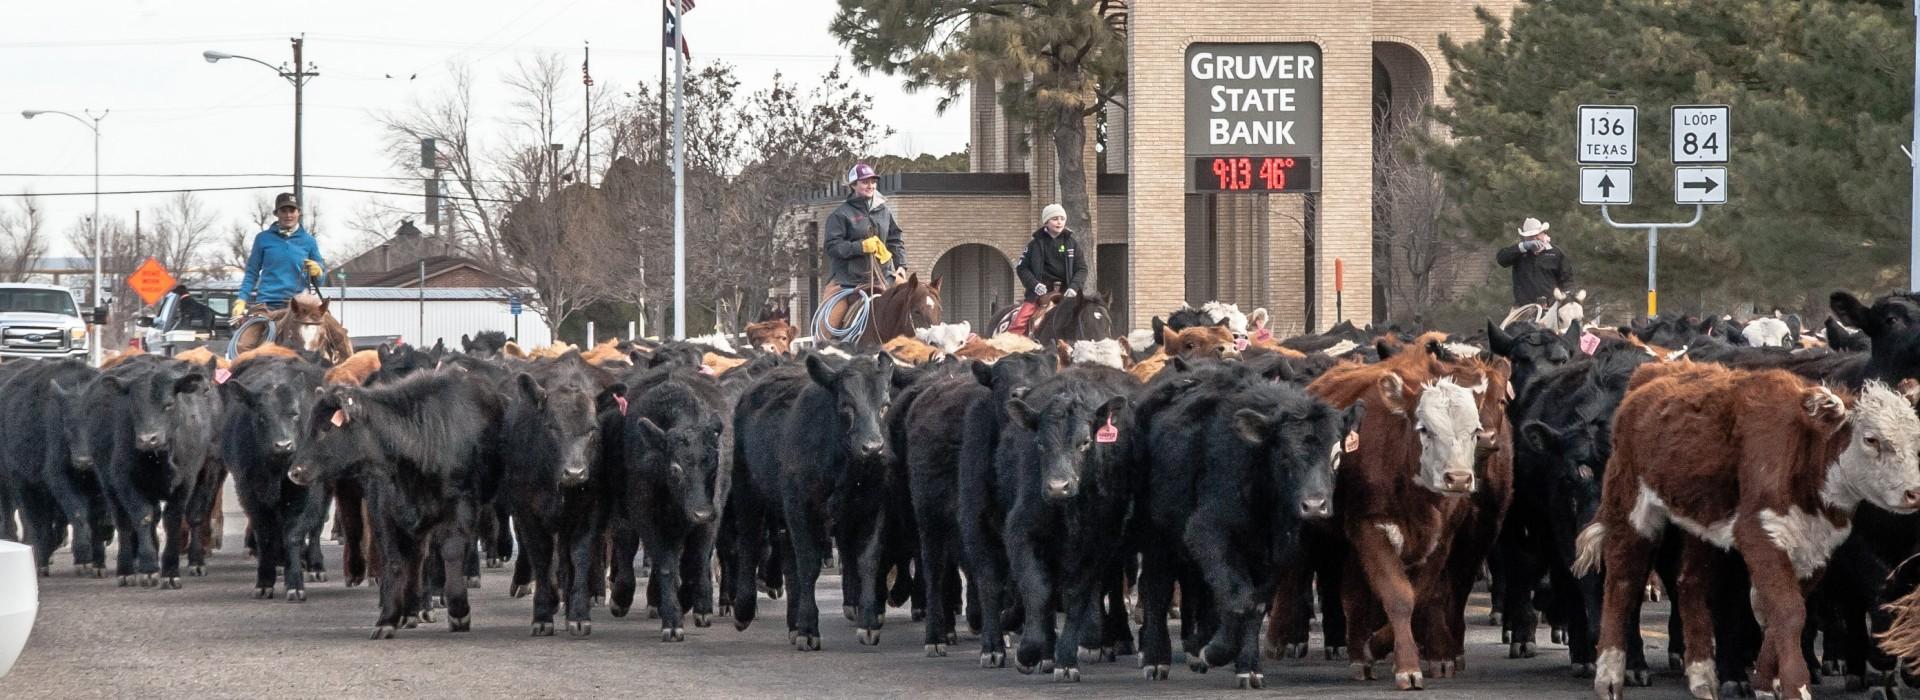 _var_www_gruverstatebank.com_public_html_greyback_core_tmp_cache_thumbnails_1920x700_574_432_crop_cattle-drive